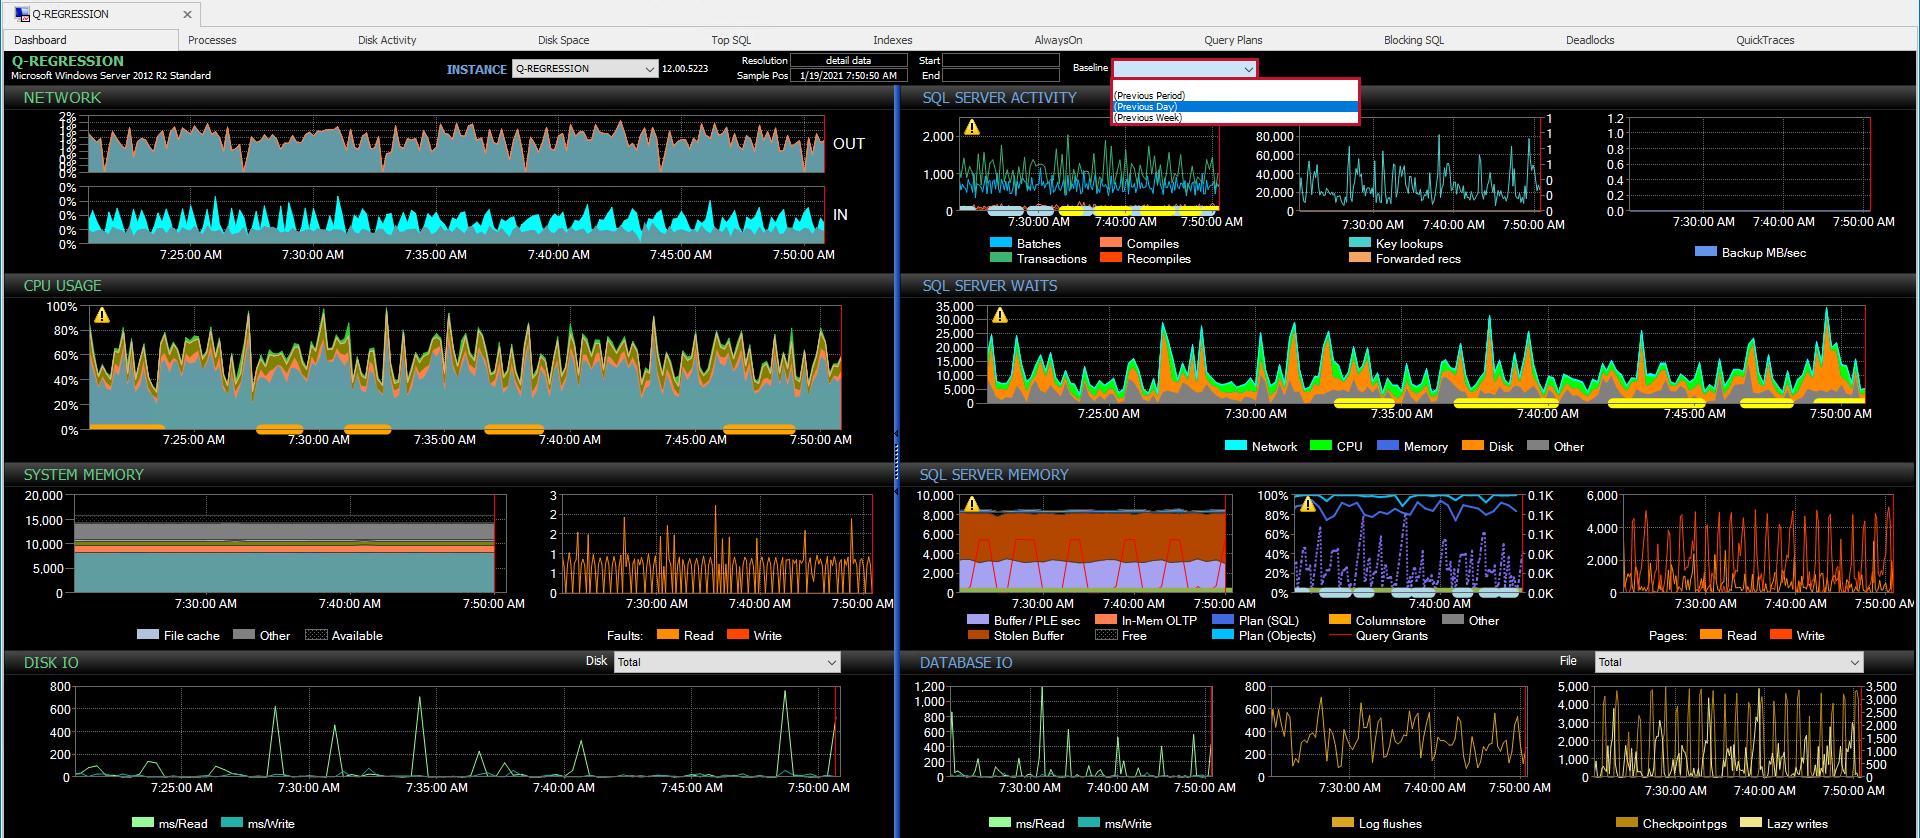 sentryone-performance-analysis-dashboard-baselines-dropdown-menu